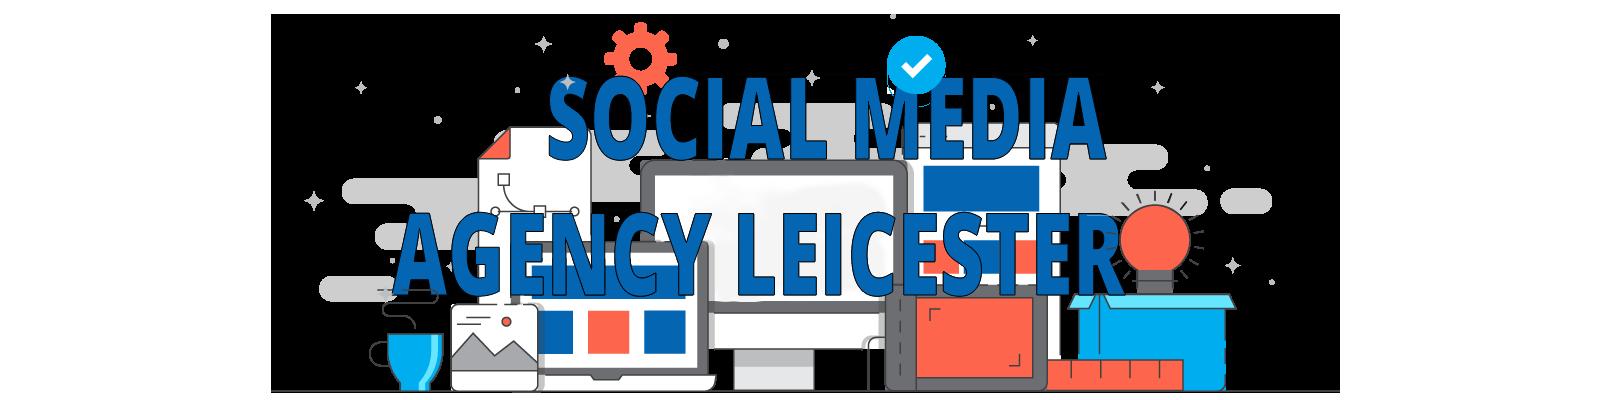 Social-Media-agency-Leicester